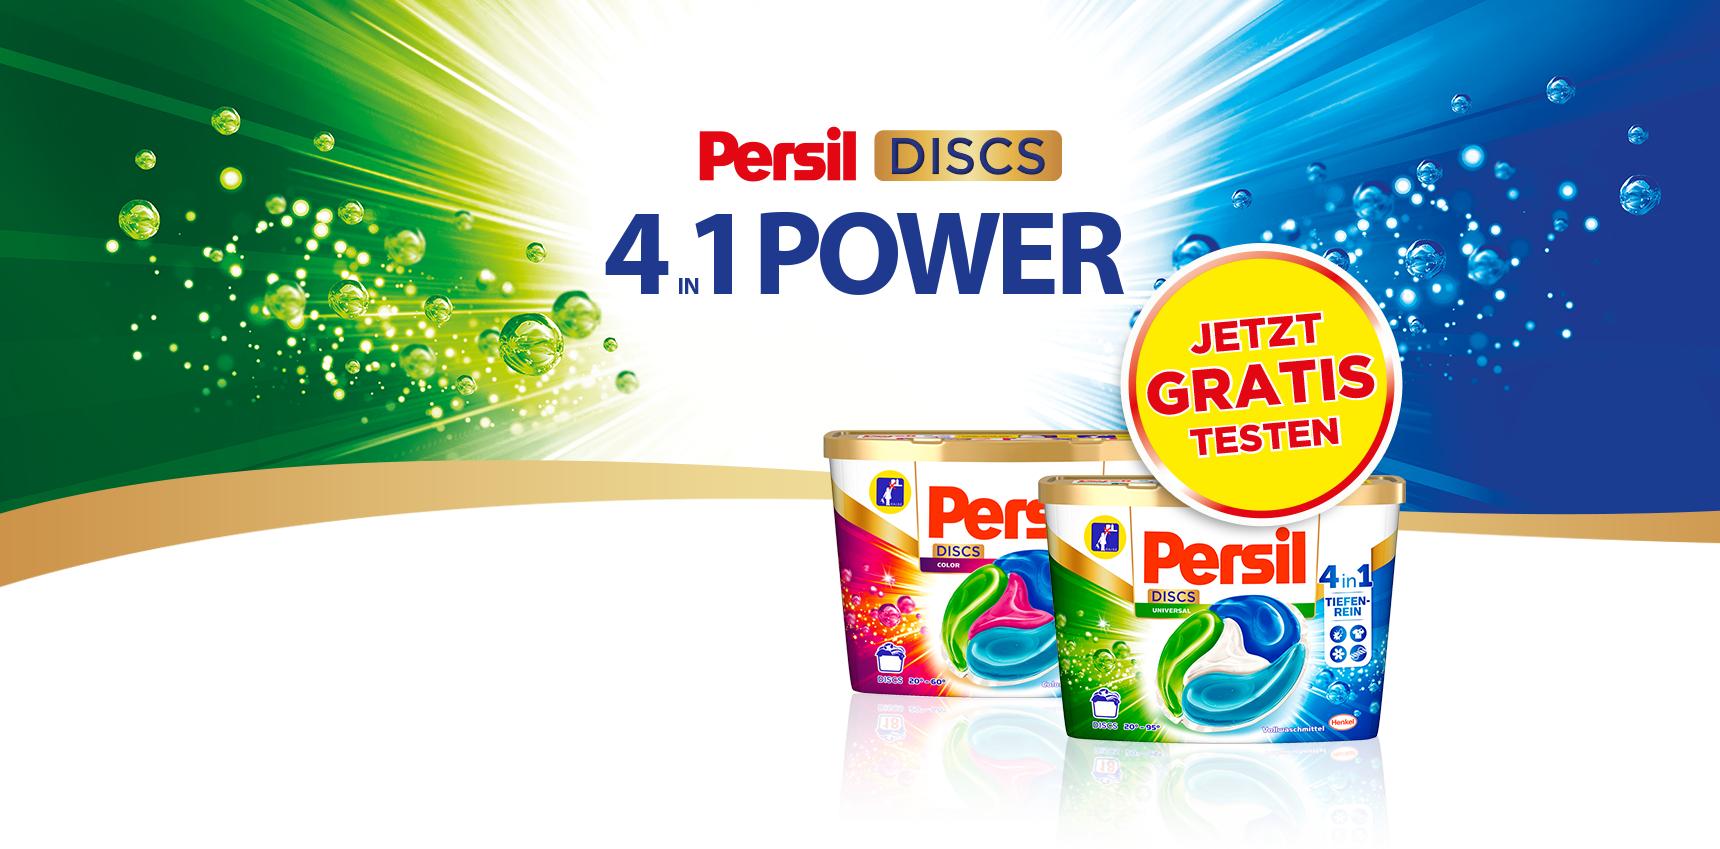 Grens-deal Duitsland - Gratis PERSIL discs 4in1